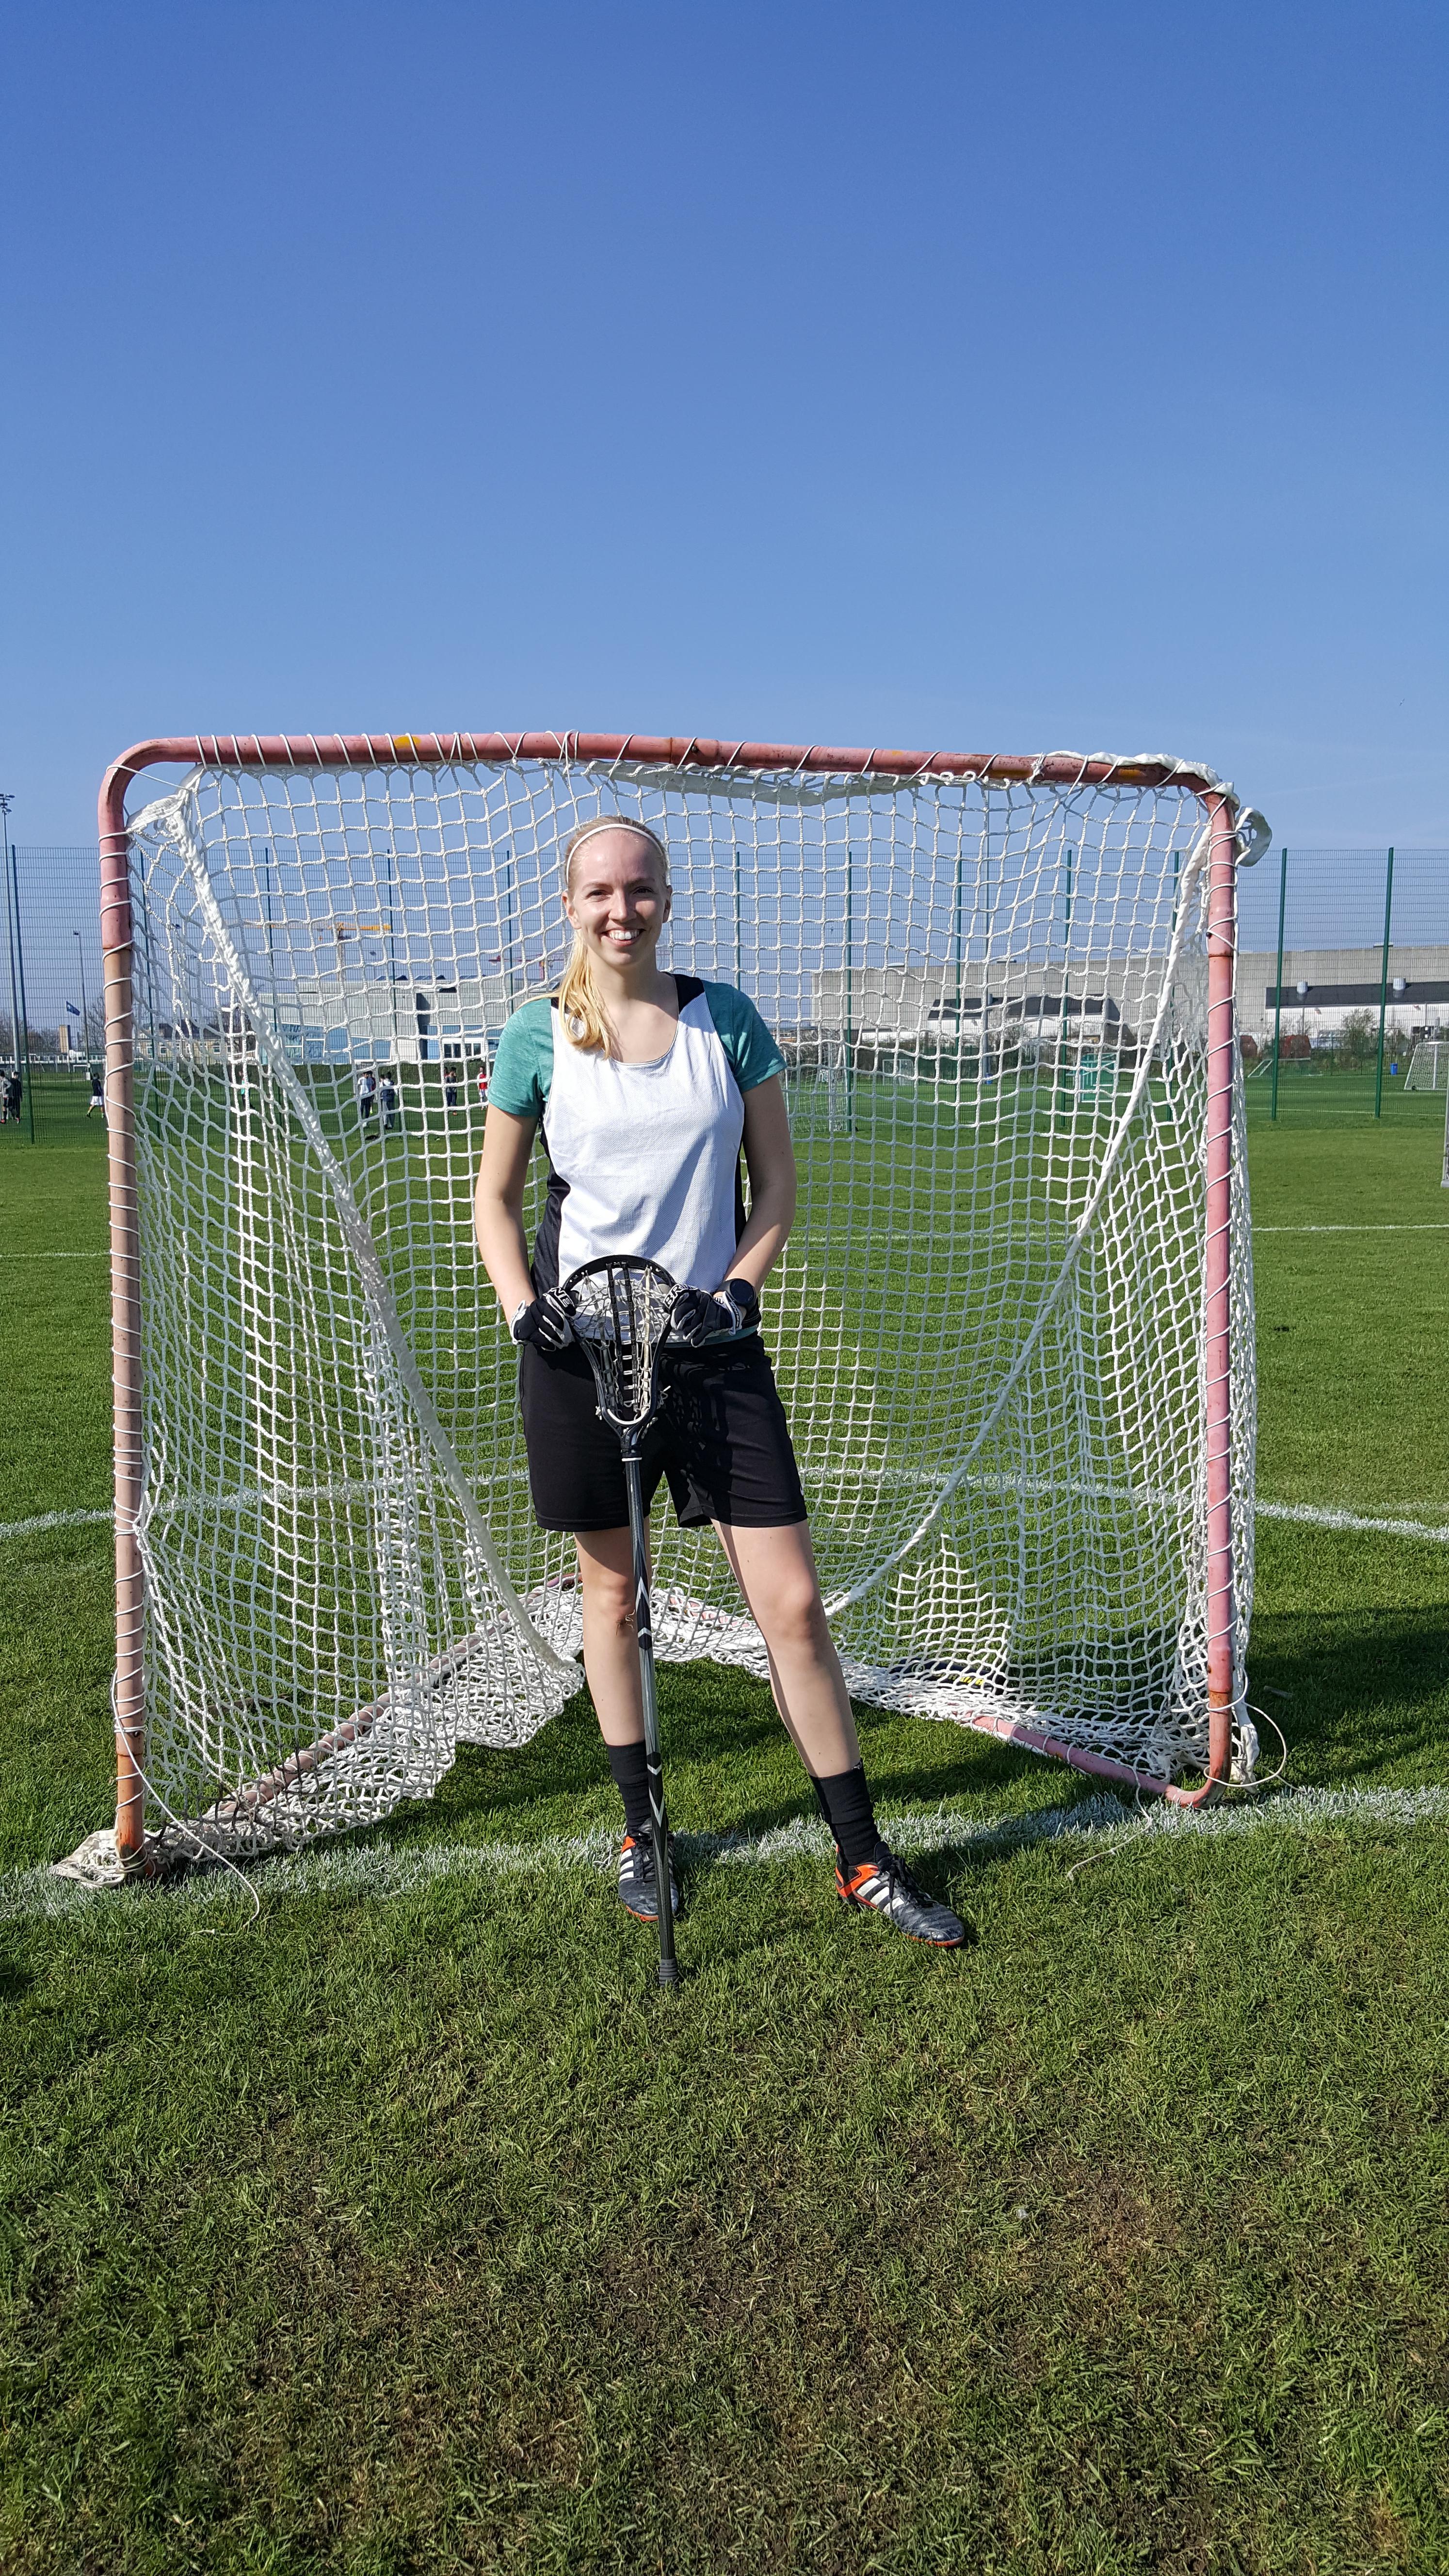 Kööpenhamina Lacrosse, Fanny Sutela